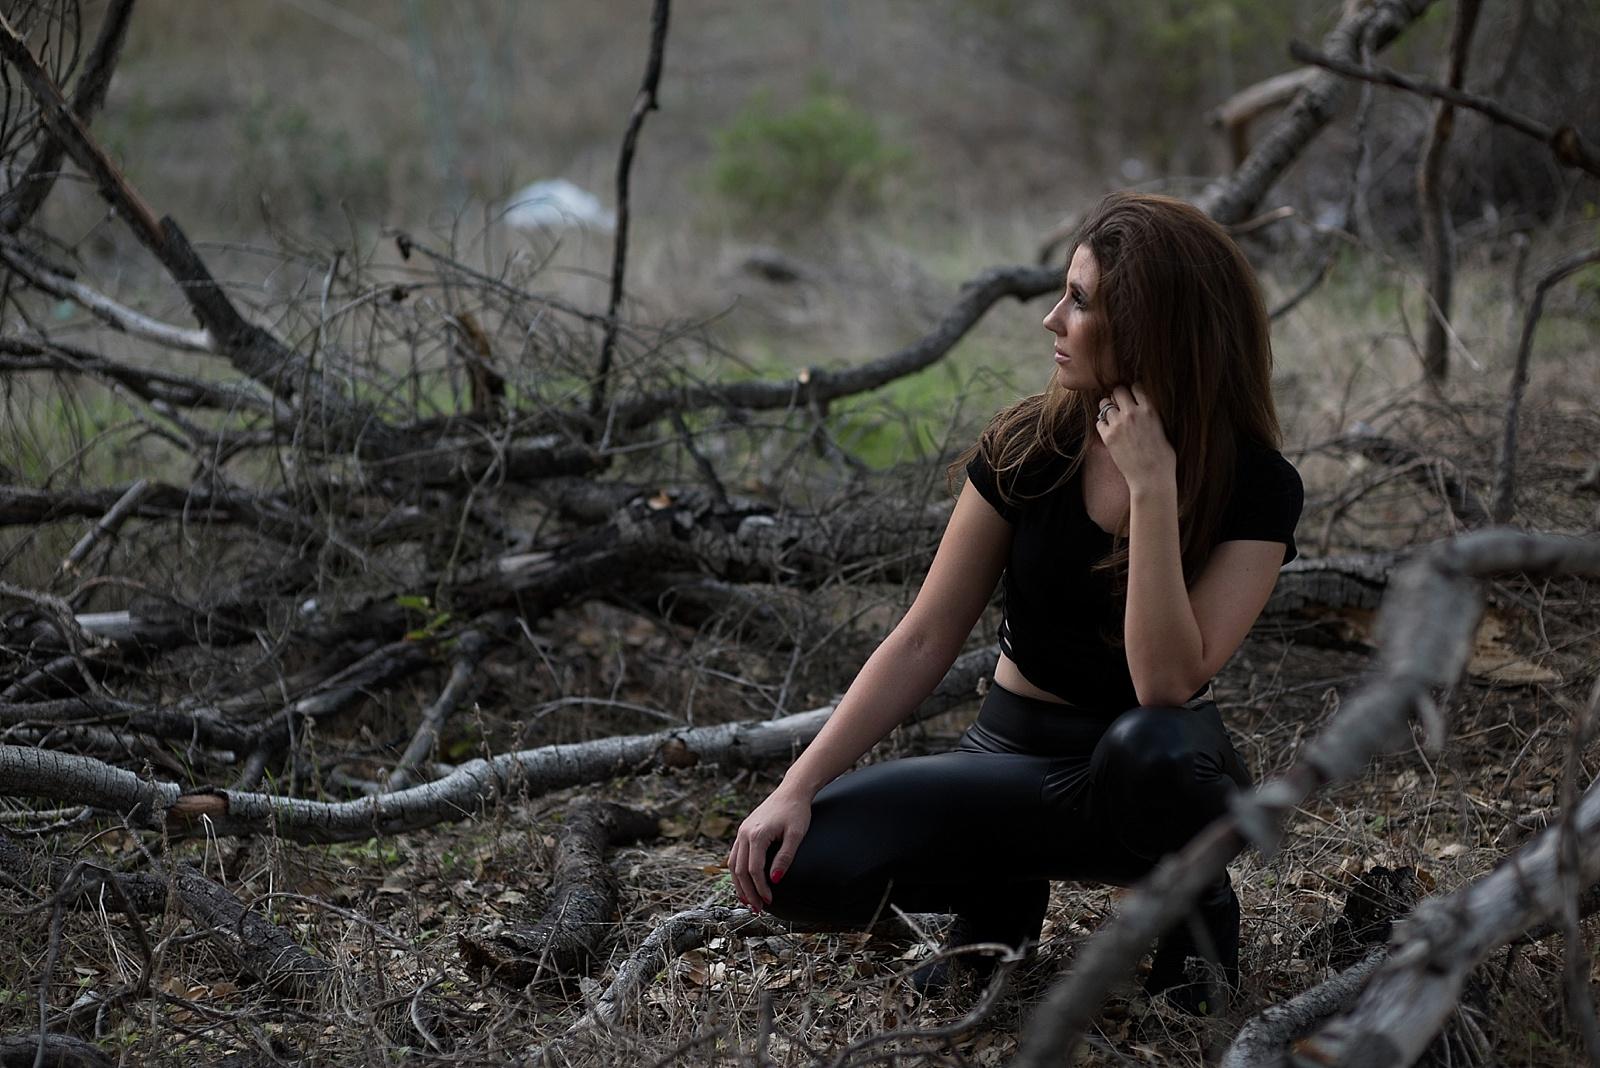 Fine art portraiture from San Diego portrait photographer Lauren Nygard